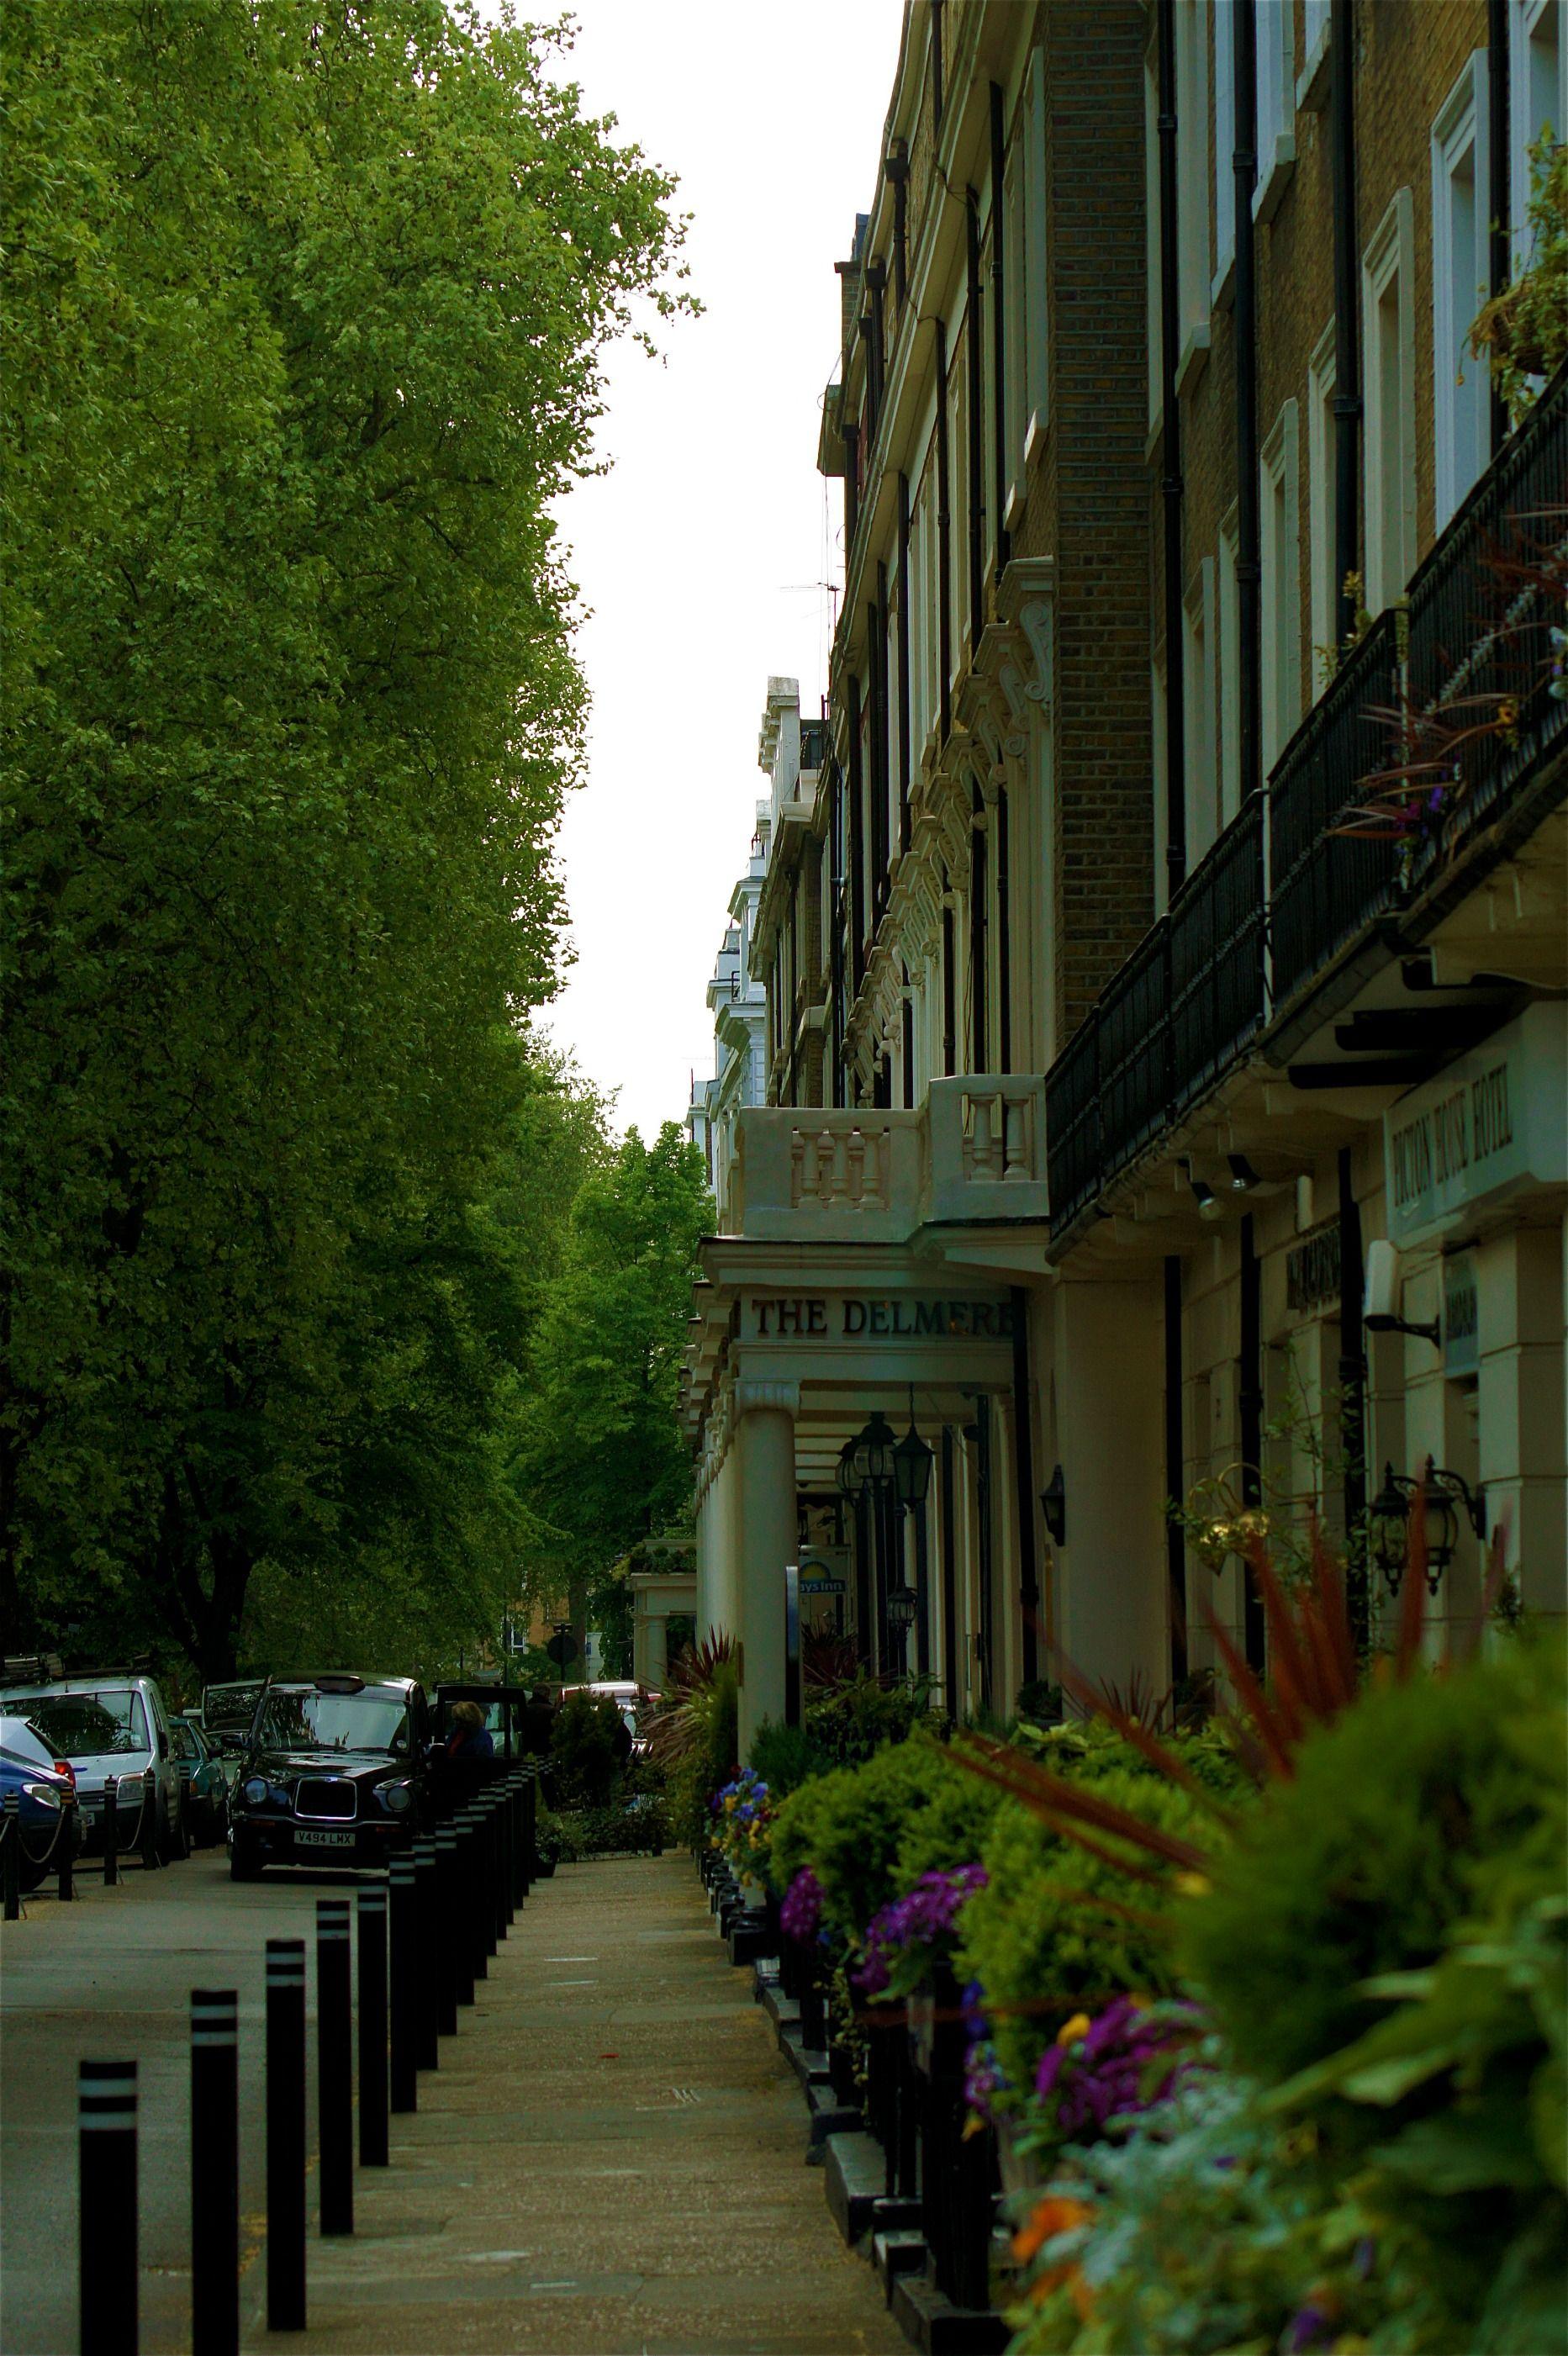 8226c4cc2c4ec4f5fa1e73bcc87caac3 - Cheap Hotels In Sussex Gardens Paddington London